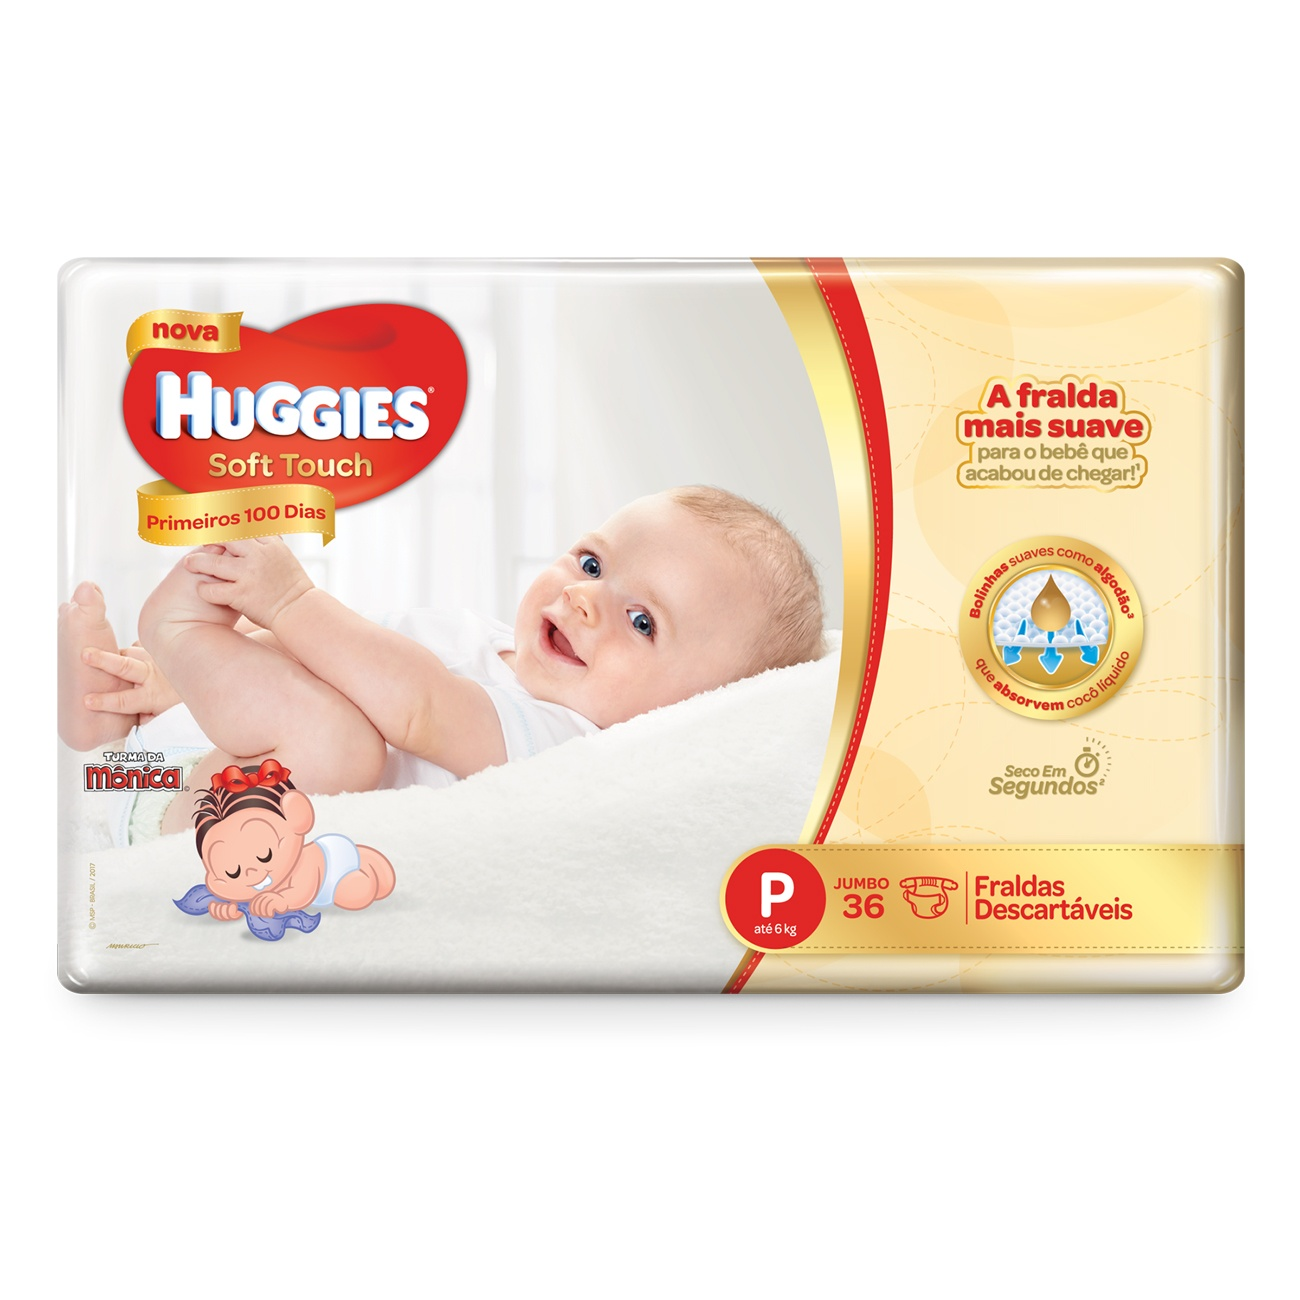 Fralda Huggies Soft Touch Primeiros 100 Dias Jumbo P 36un